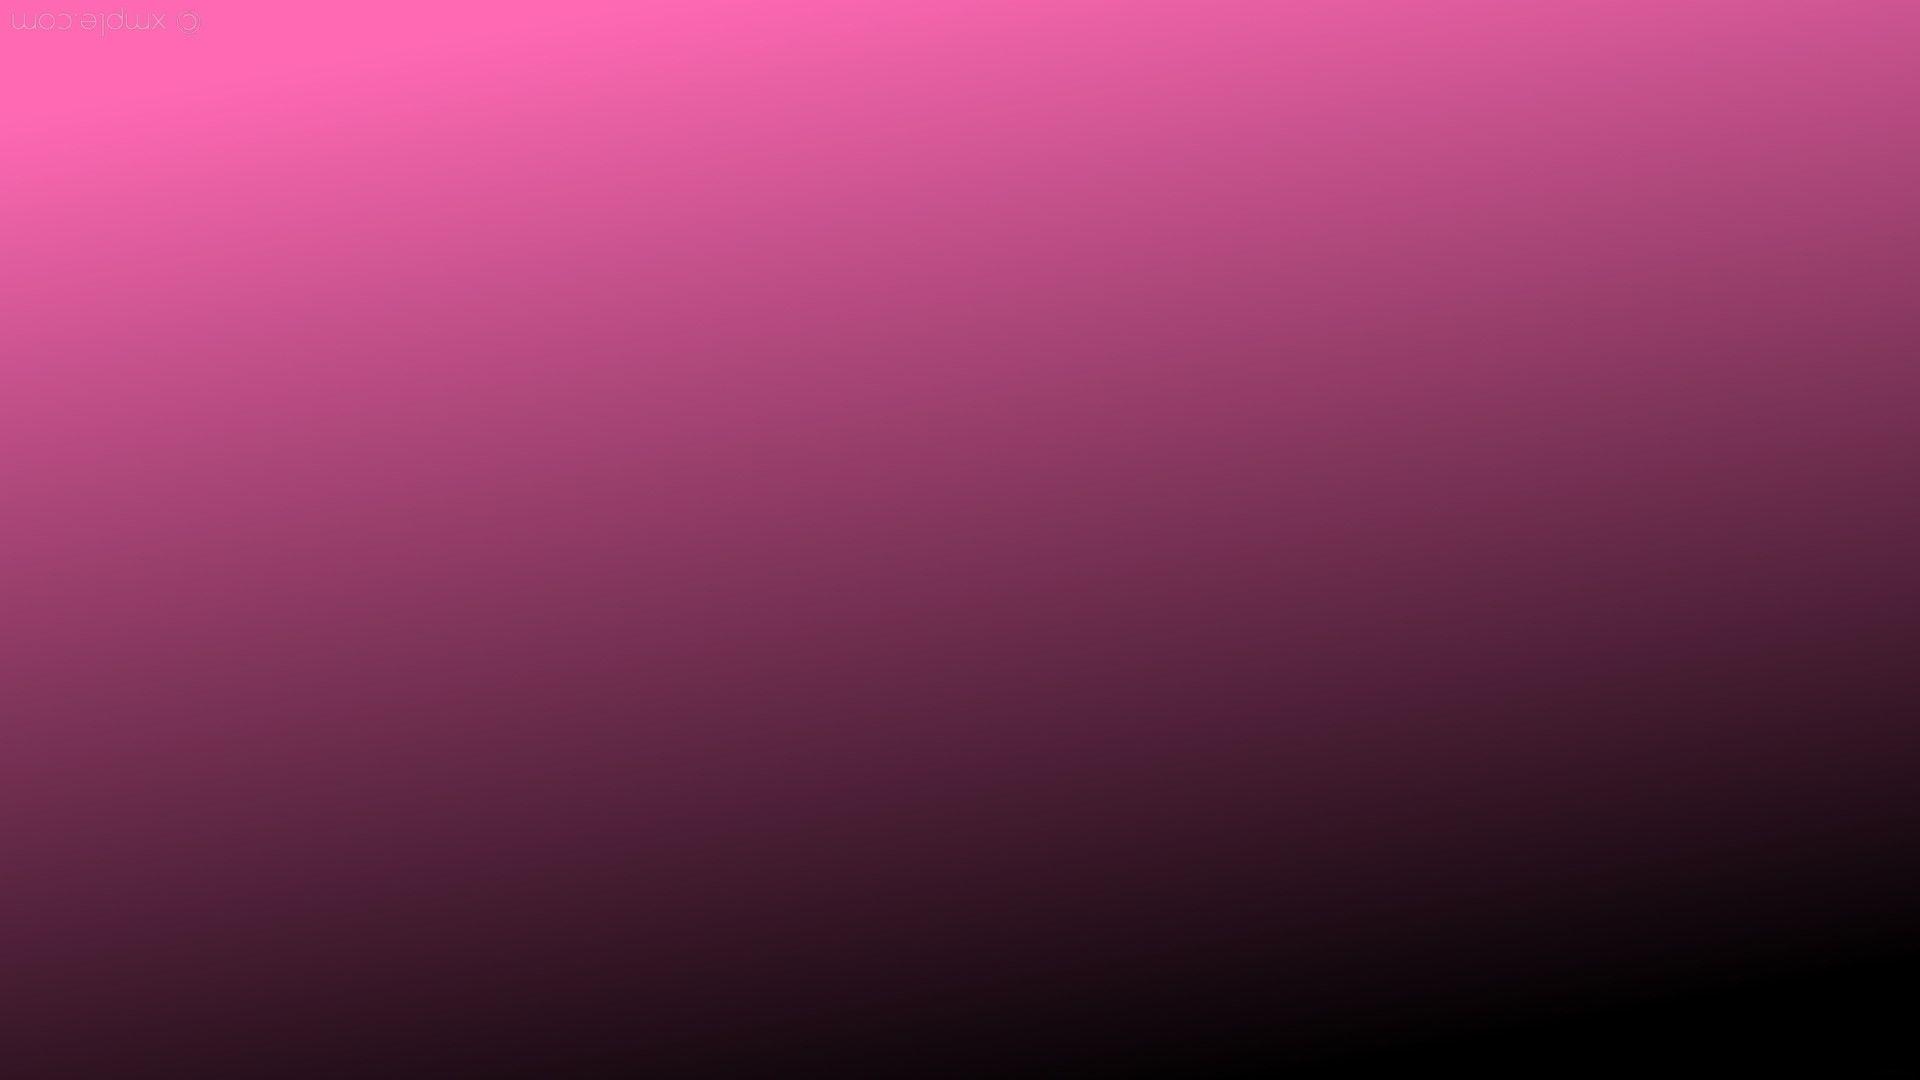 List of Good Black Wallpaper Iphone Dark Rose for iPhone XR 2020